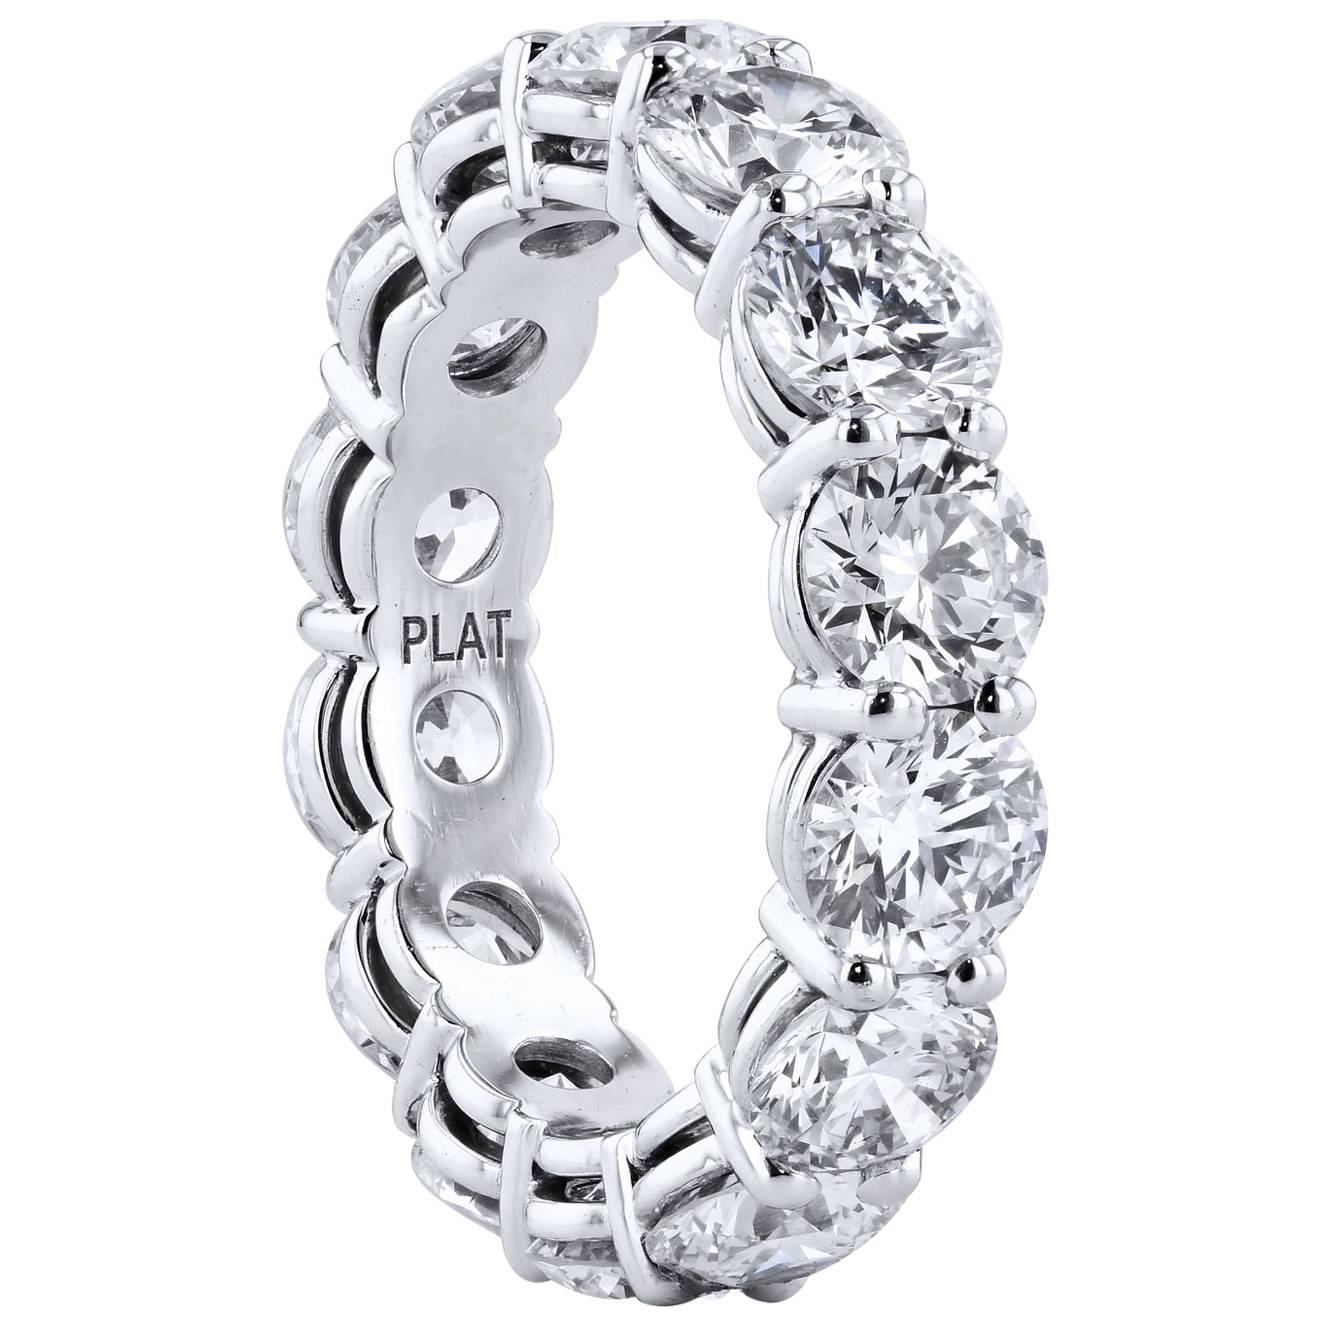 Handmade 5.83 Carat Diamond Shared-Prong Eternity Band Ring